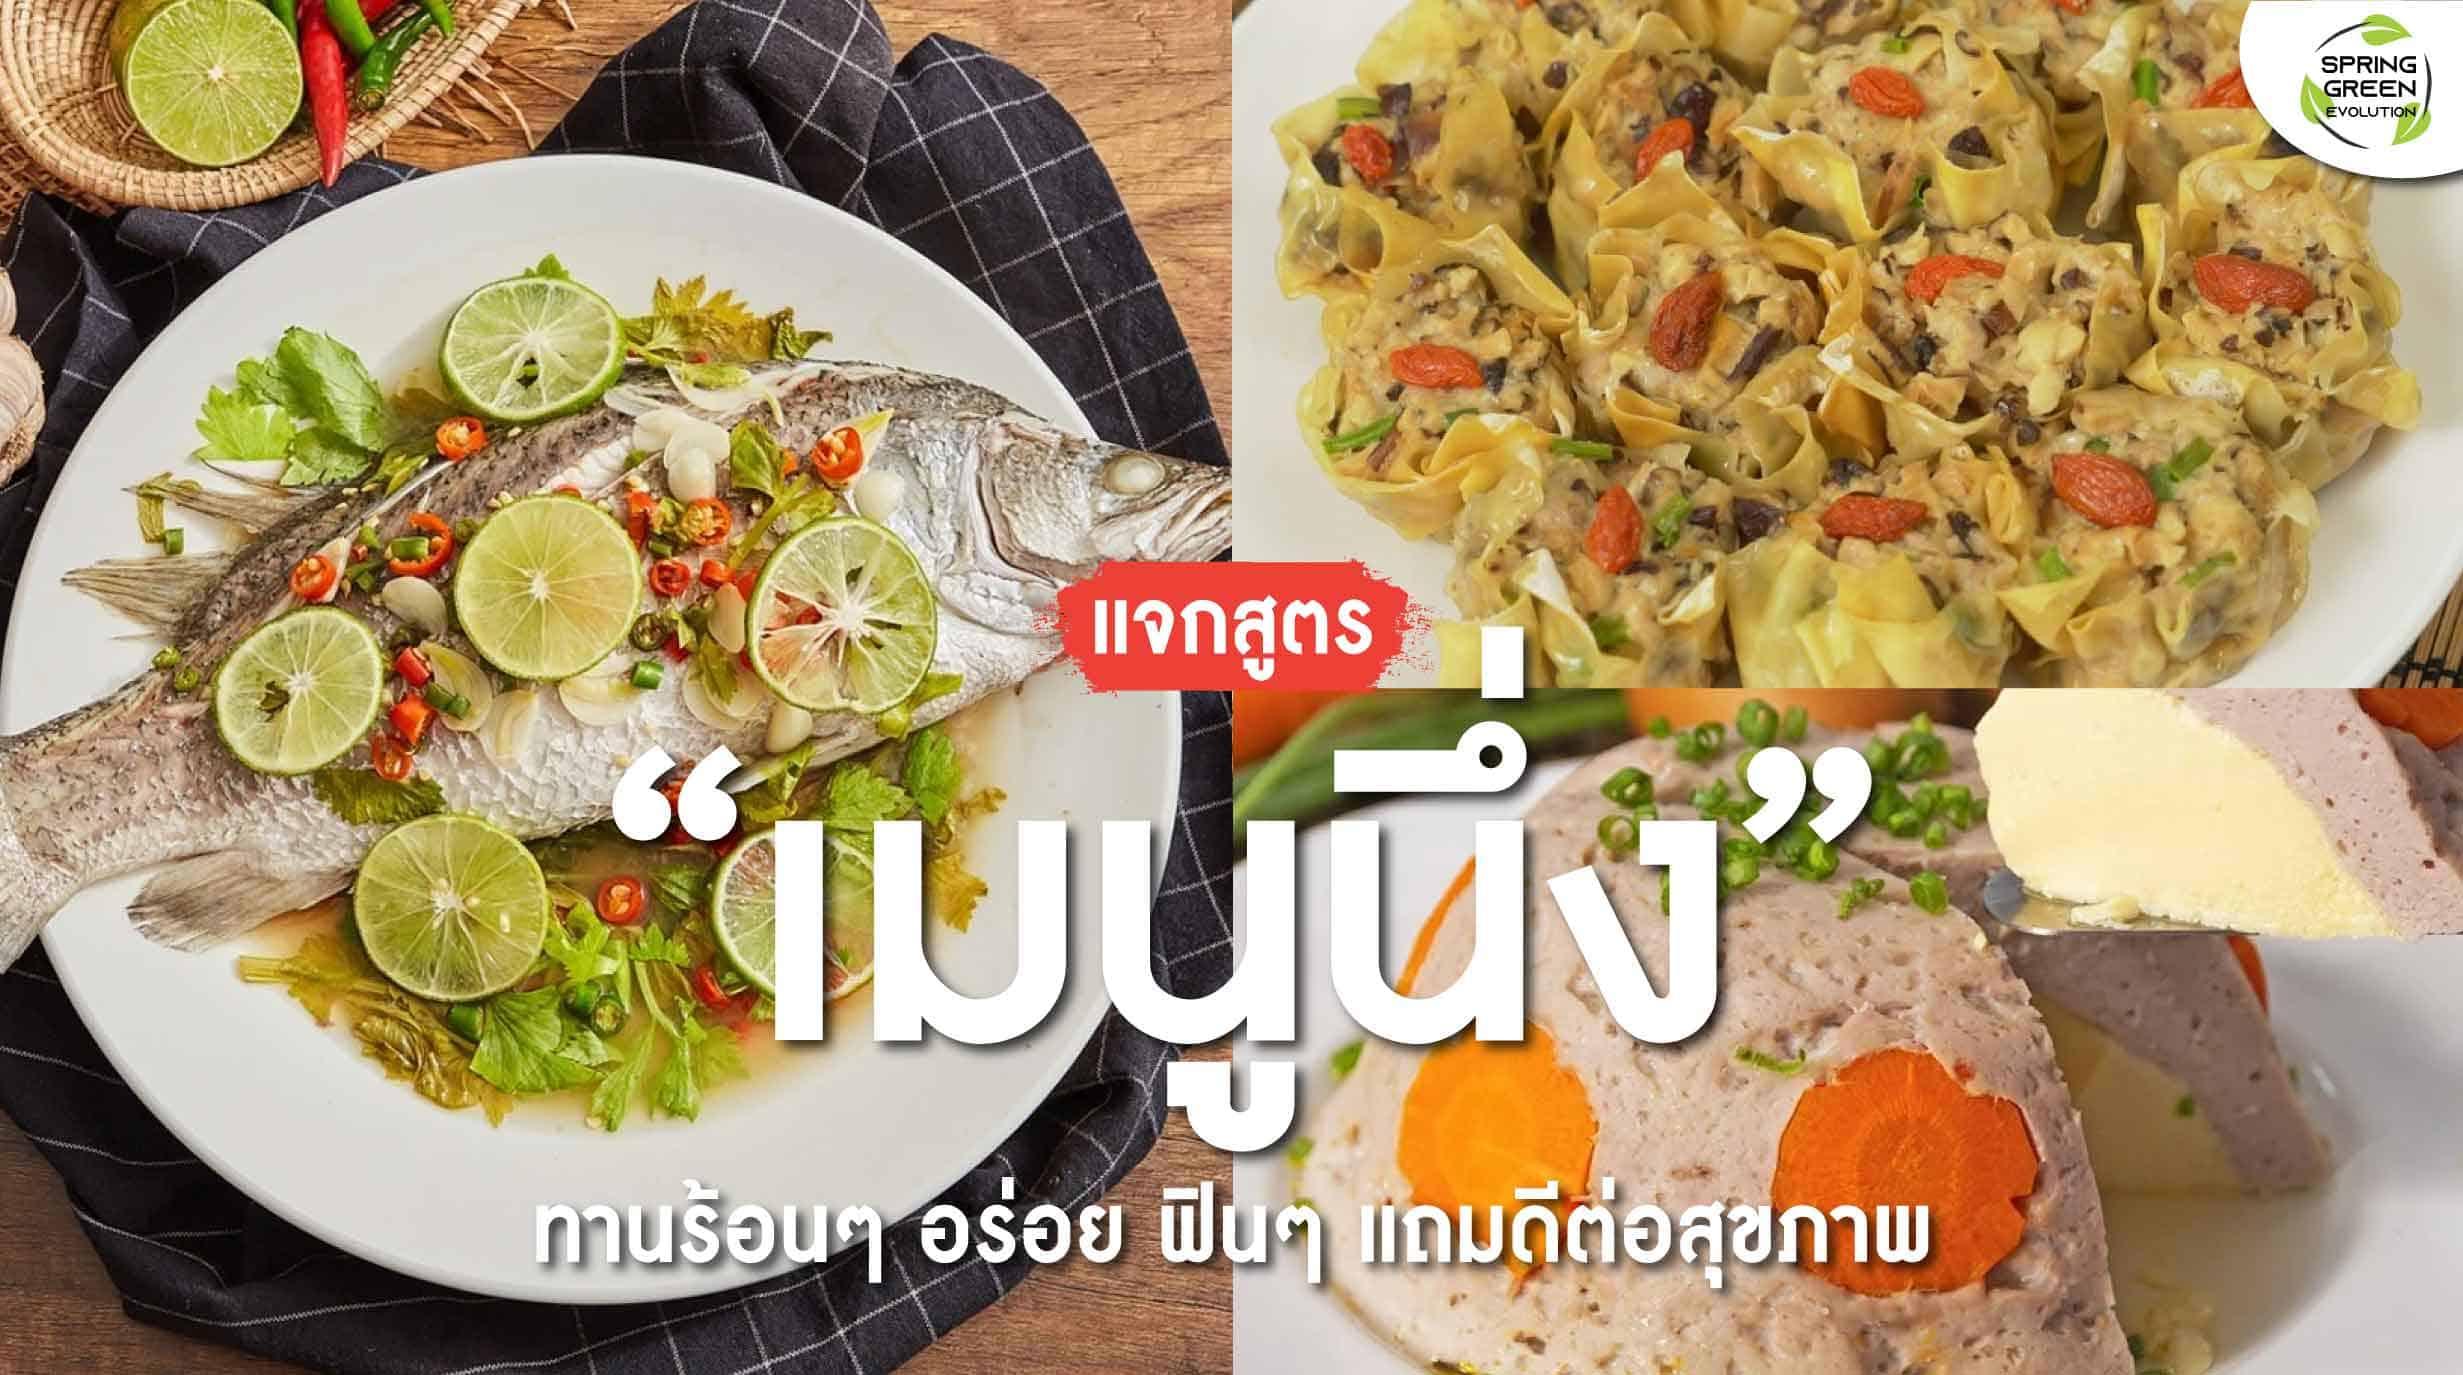 210923-Content-เมนูนึ่ง-ทานร้อนๆ-ทำง่ายๆ-เพื่อสุขภาพ01